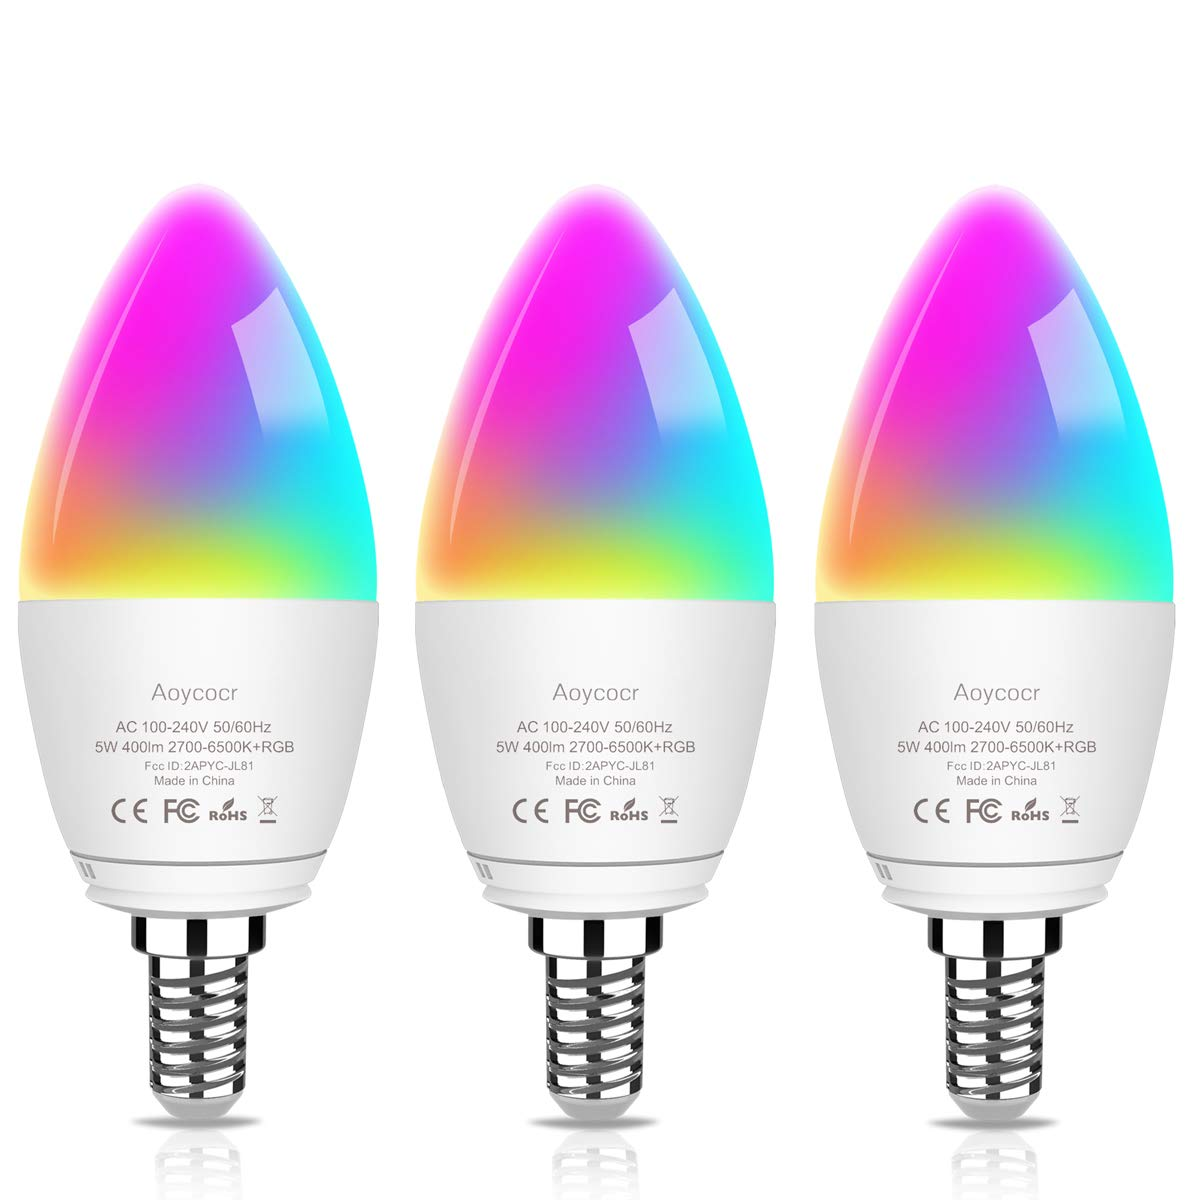 Candelabra Chandelier Lighting Lumens equiv